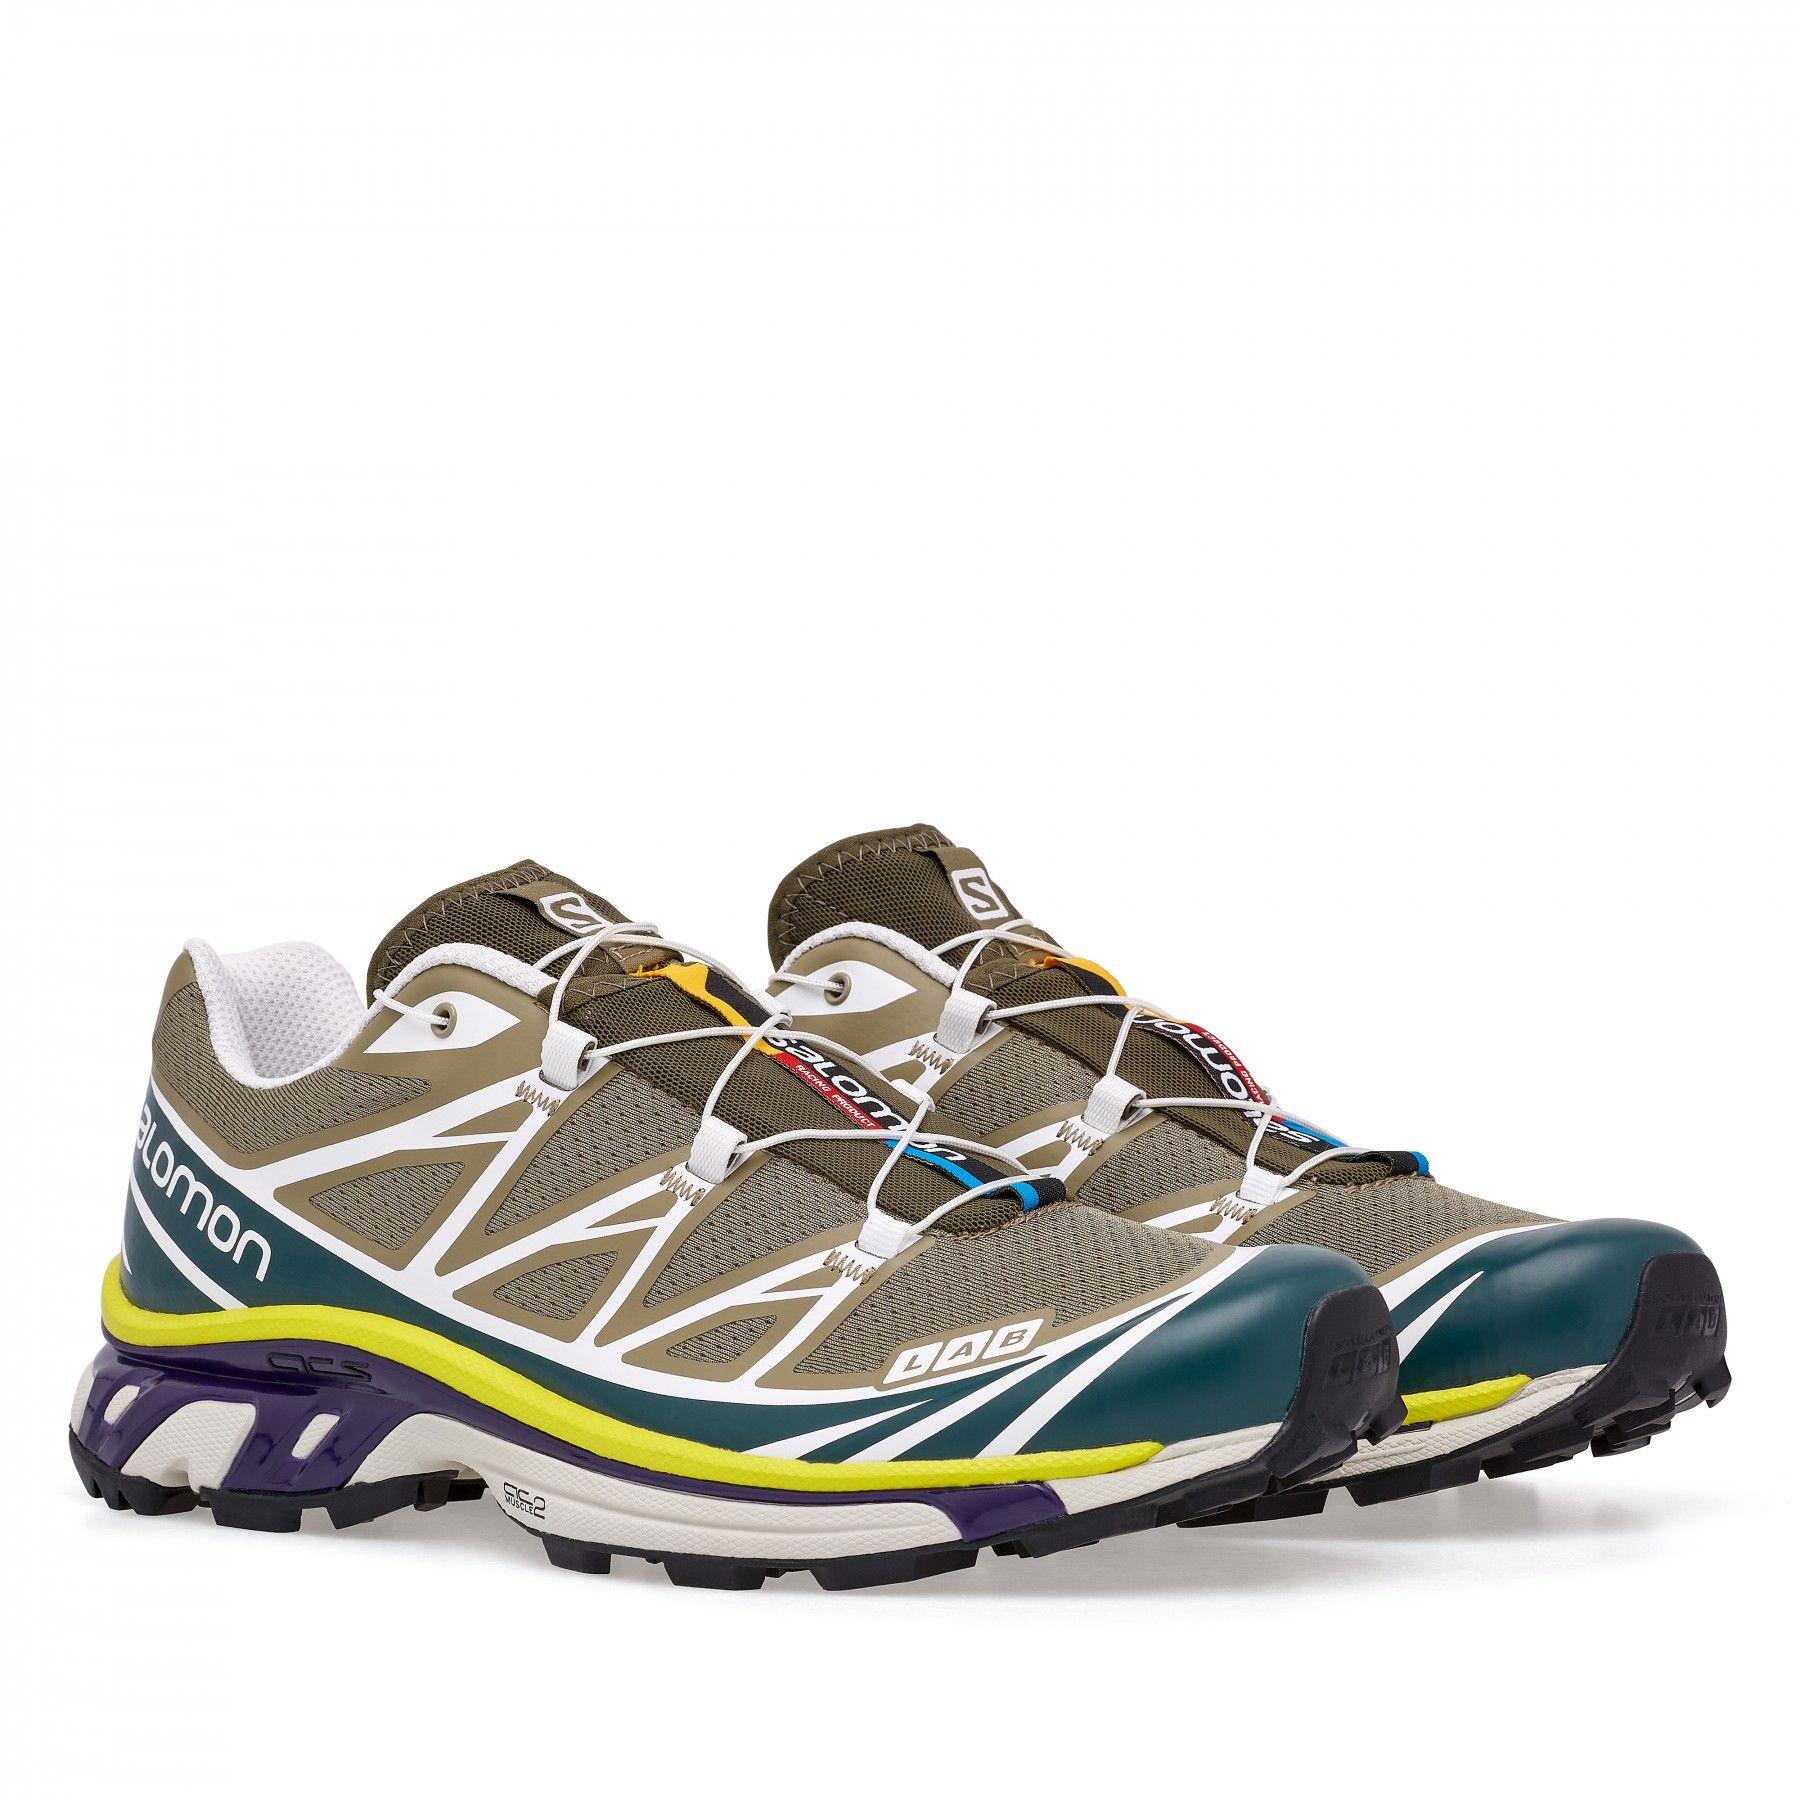 Salomon SLab Xt 6 Lt Adv (Green) | Shoes in 2019 | Running